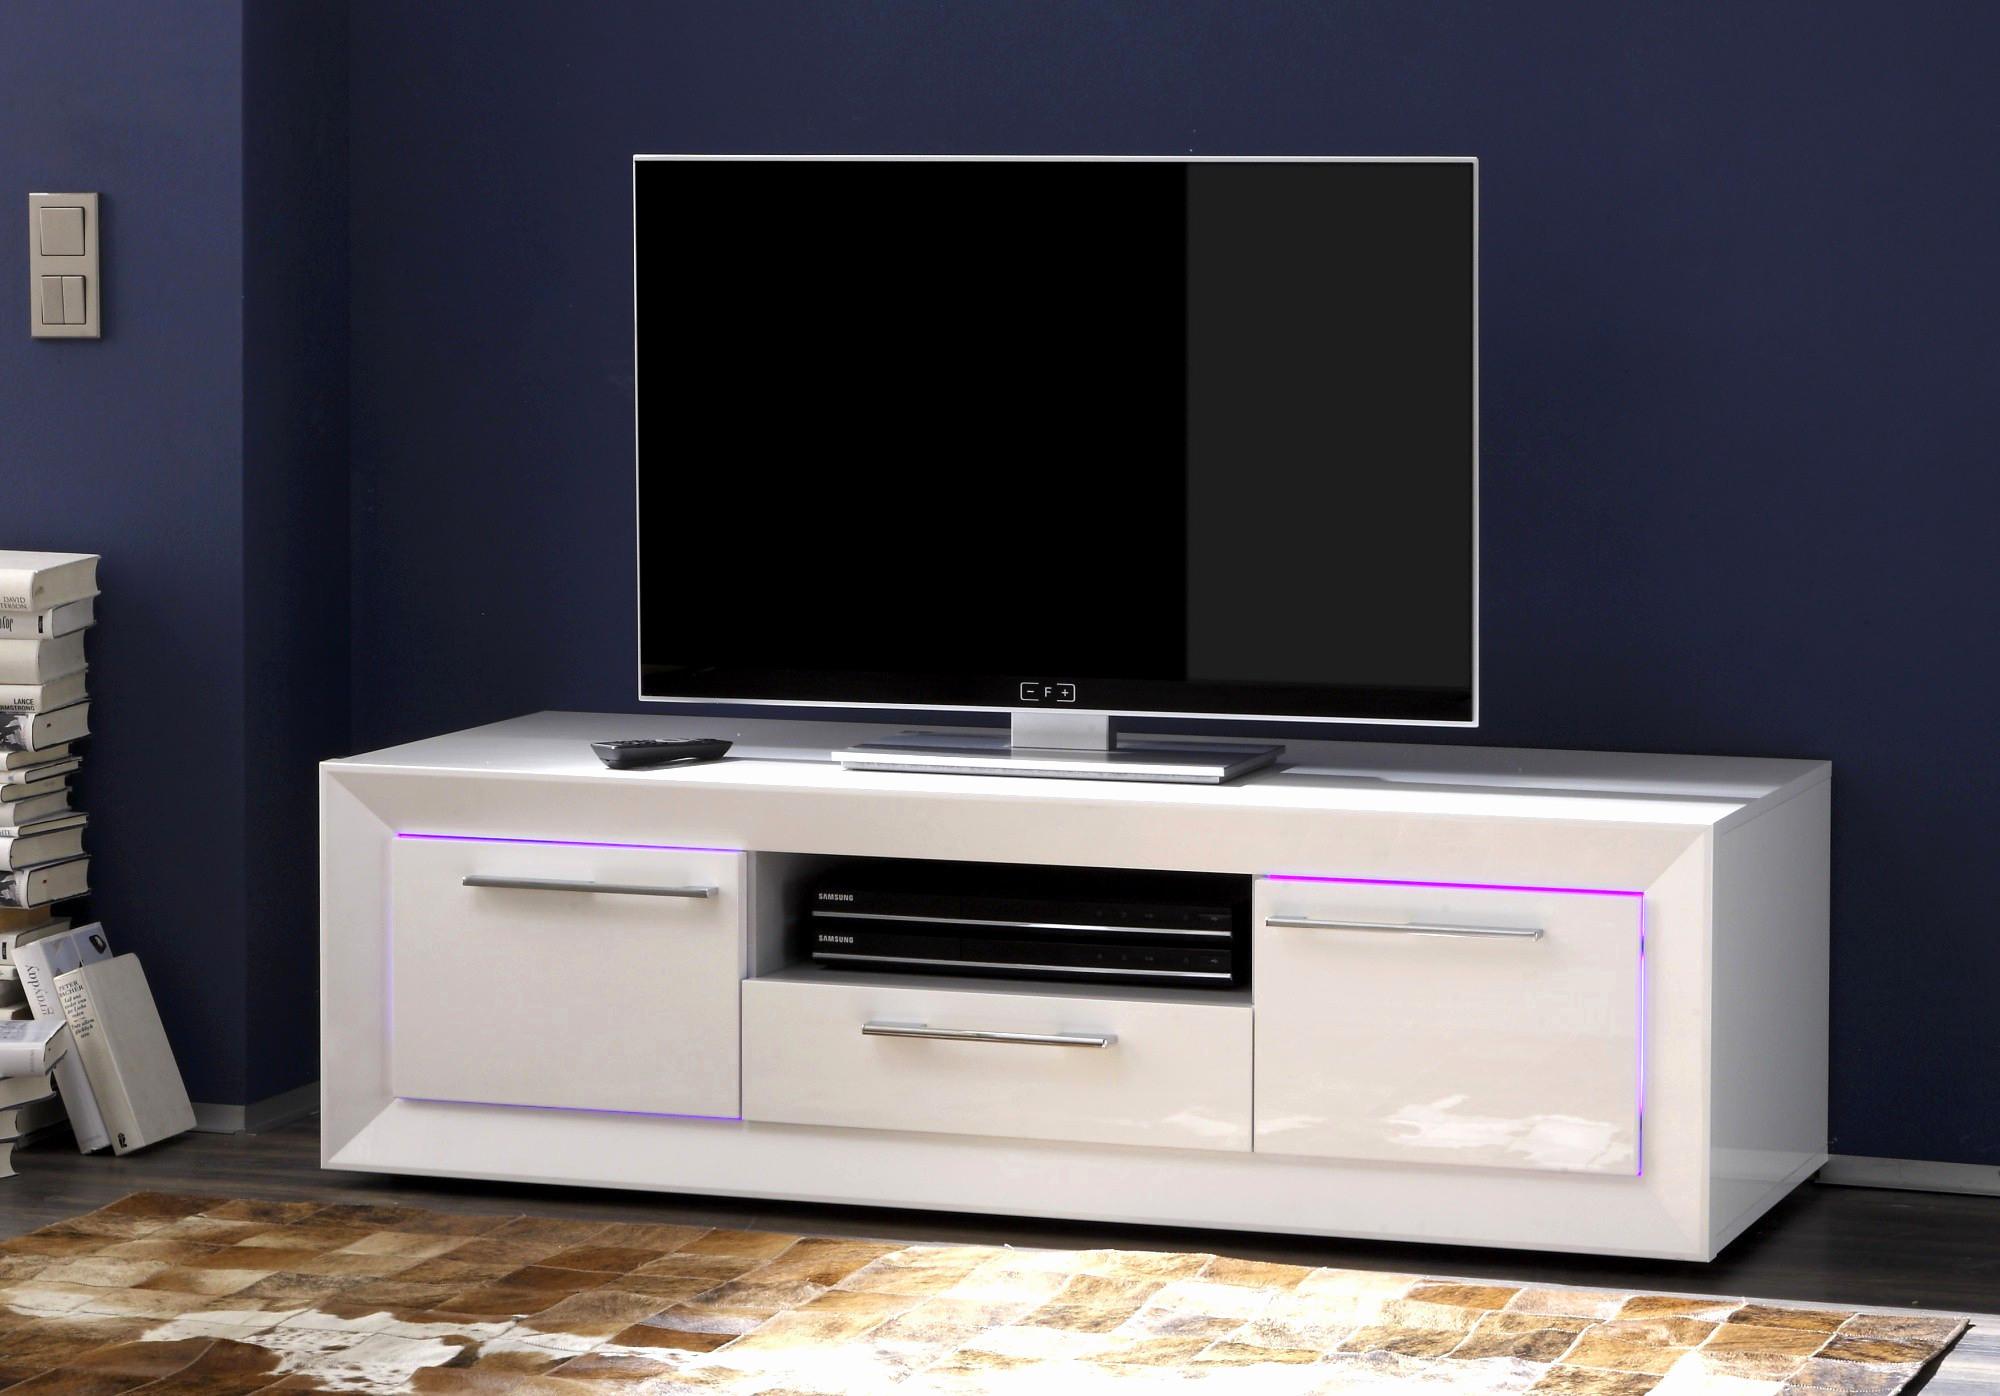 meuble tele cdiscount cdiscount meuble salon meuble tv mur unique search results meuble tv of meuble tele cdiscount